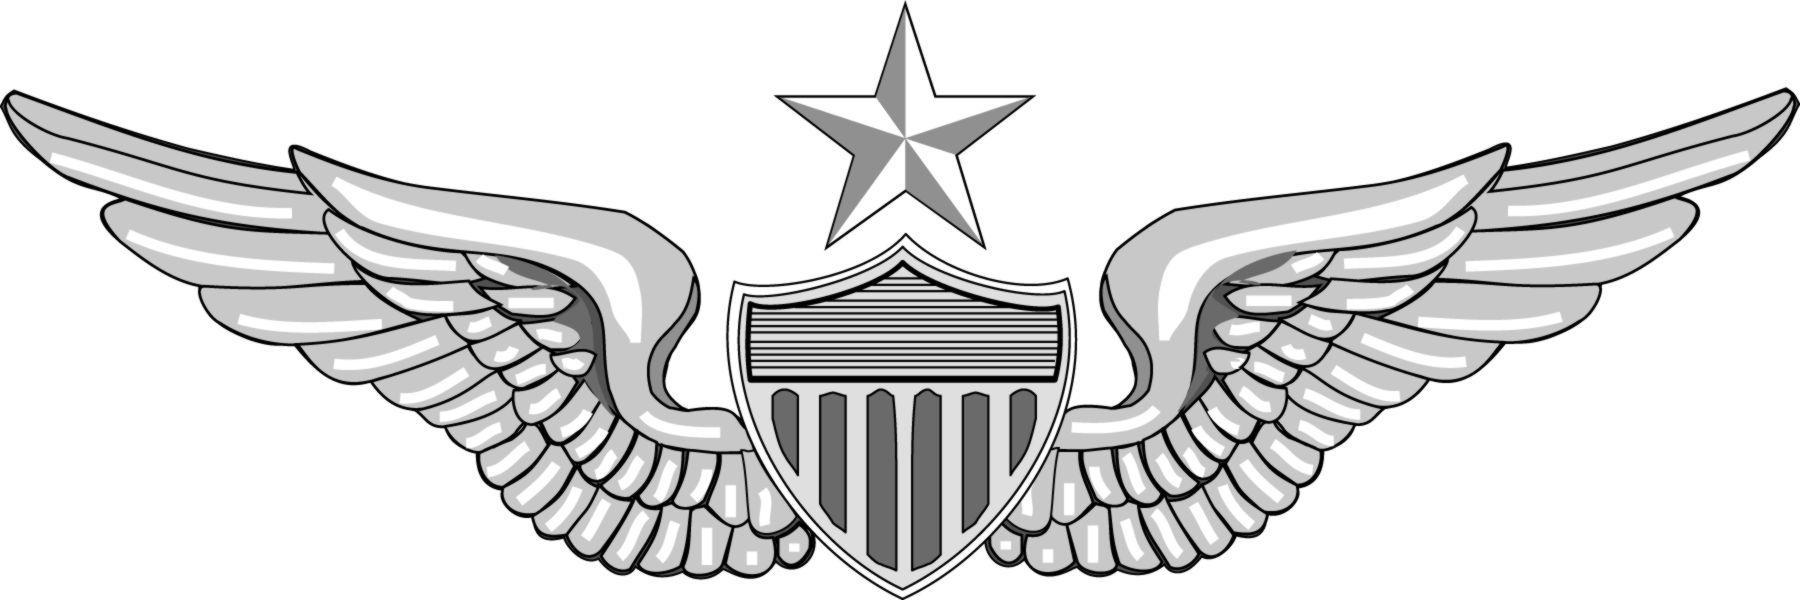 Us army clip art clip art library download U.S. Army Clip Art - Qualification Badges clip art library download